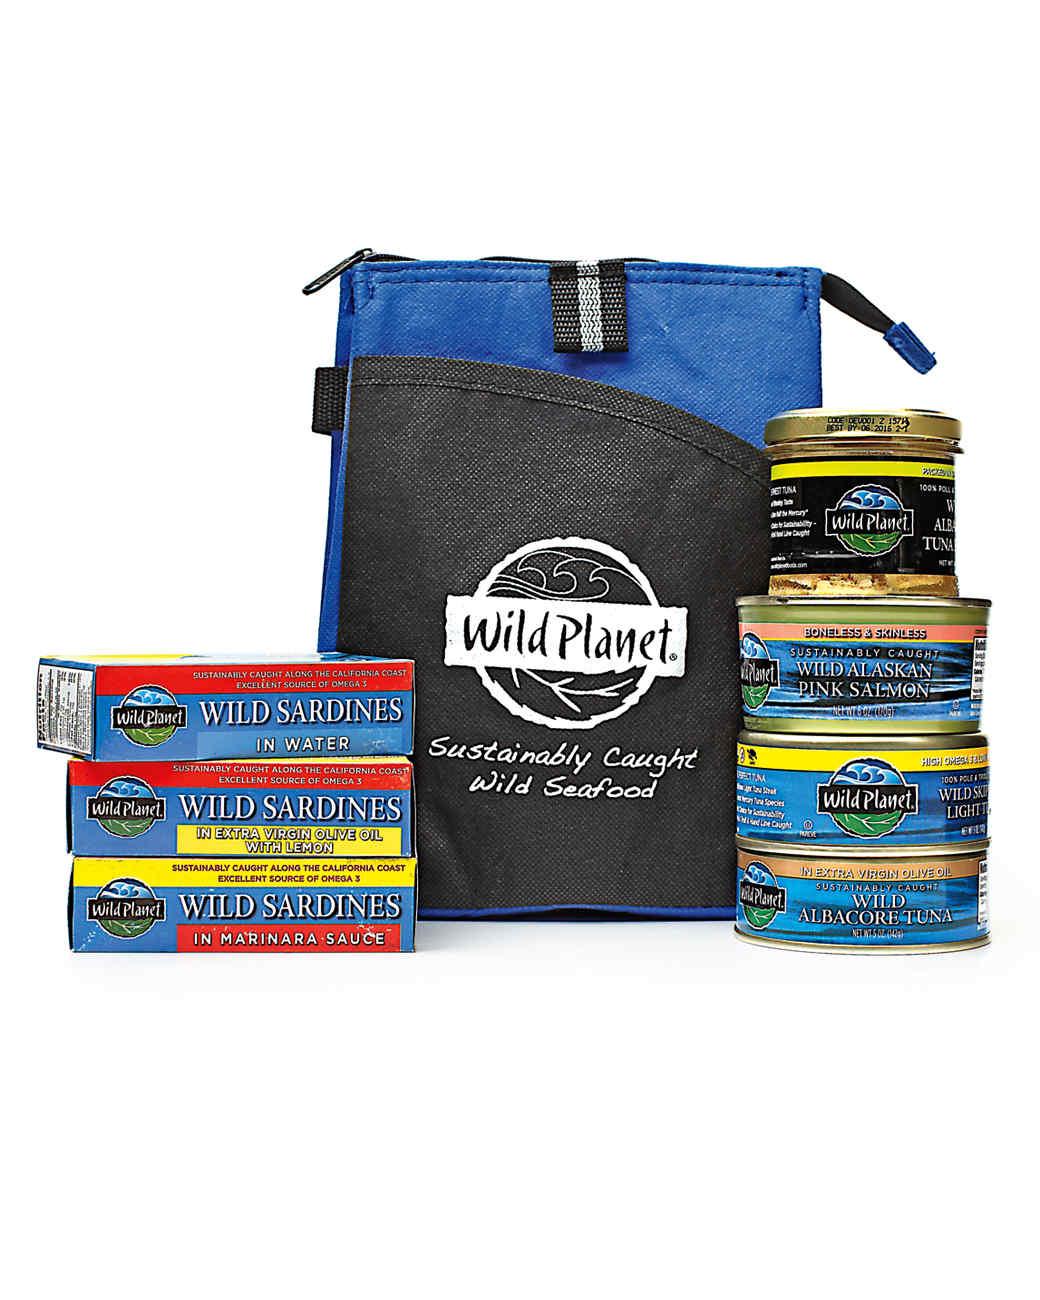 wild-planet-giveaway-mbd108465.jpg